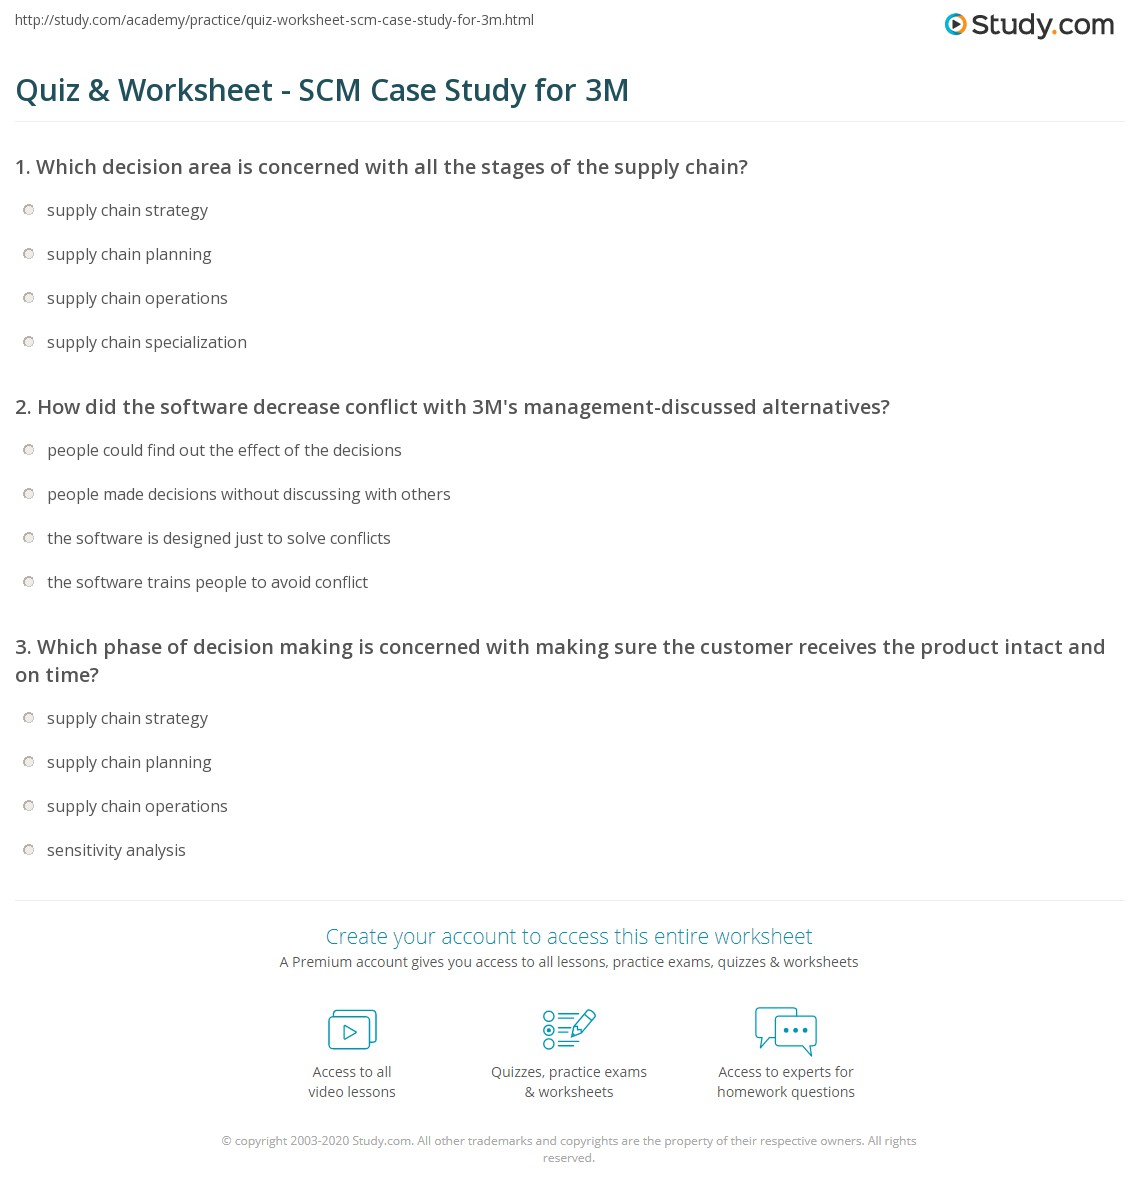 Quiz & Worksheet - SCM Case Study for 3M | Study.com